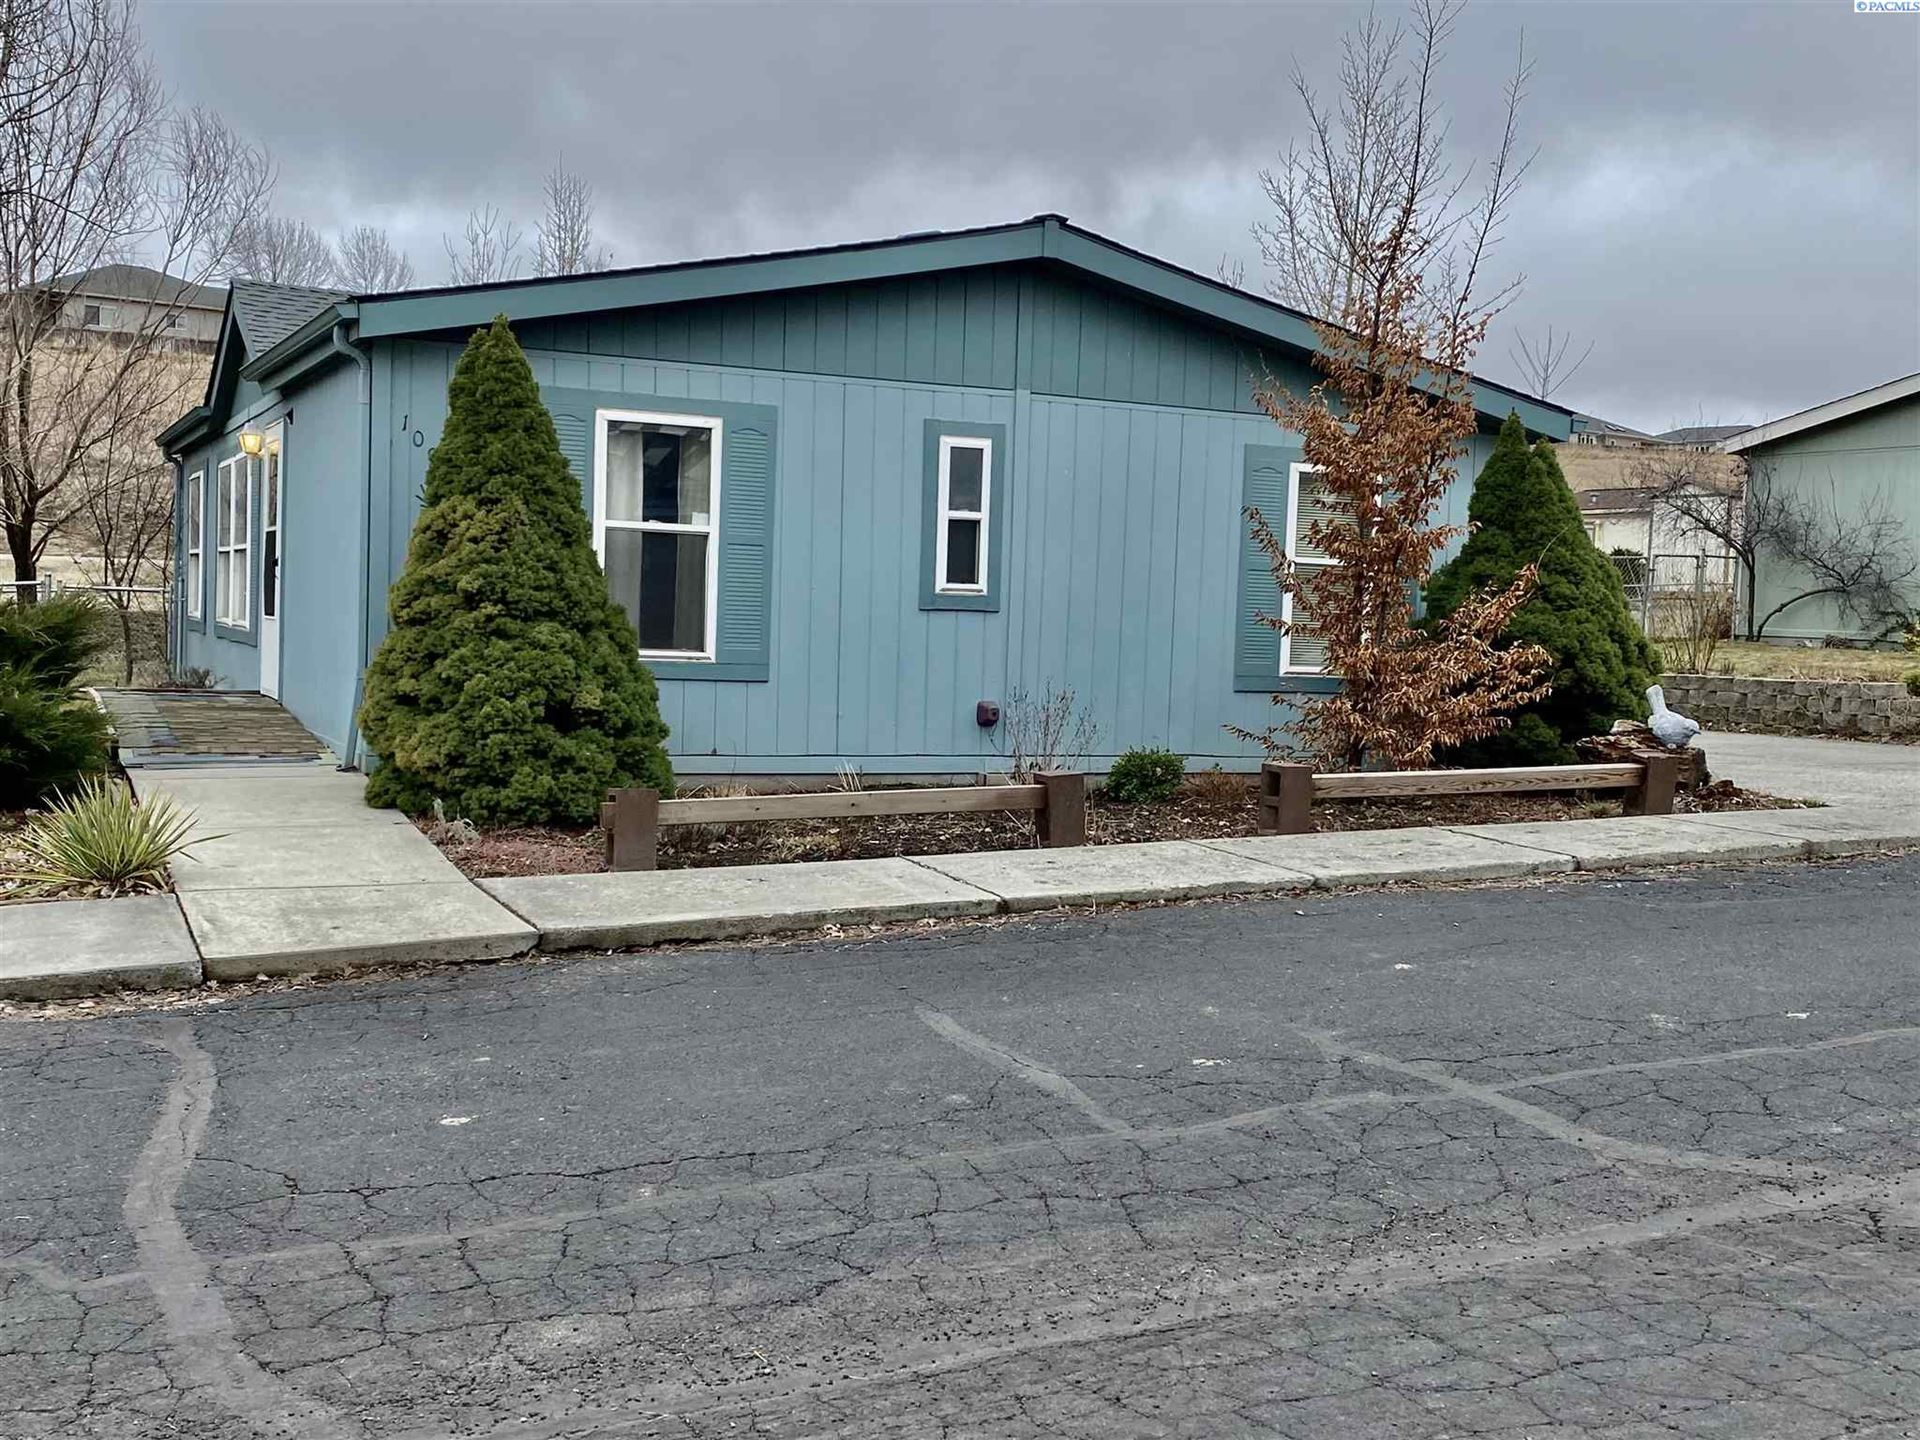 Photo of 109 NW Glenhaven, Pullman, WA 99163 (MLS # 252328)